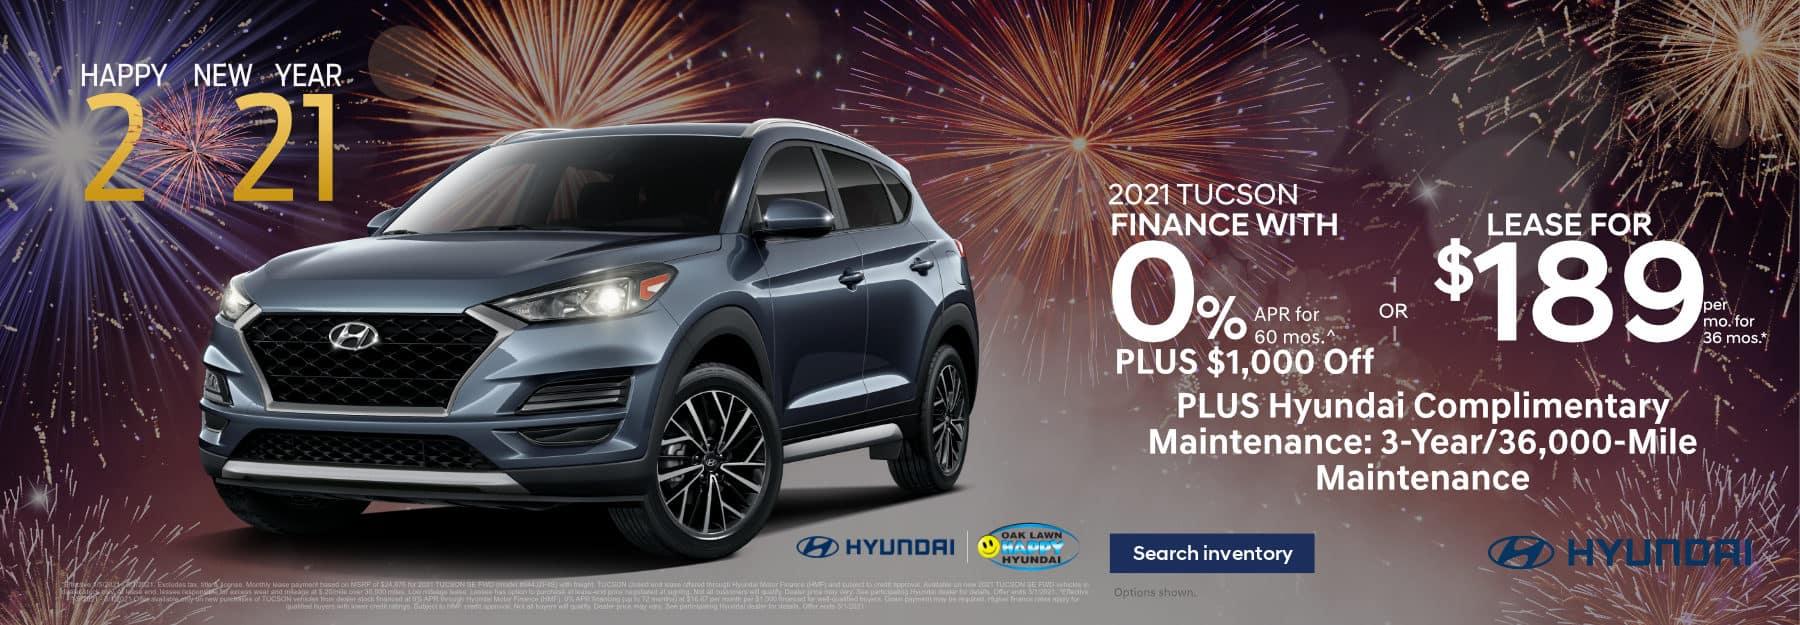 January_2021_Tucson_Happy_Hyundai